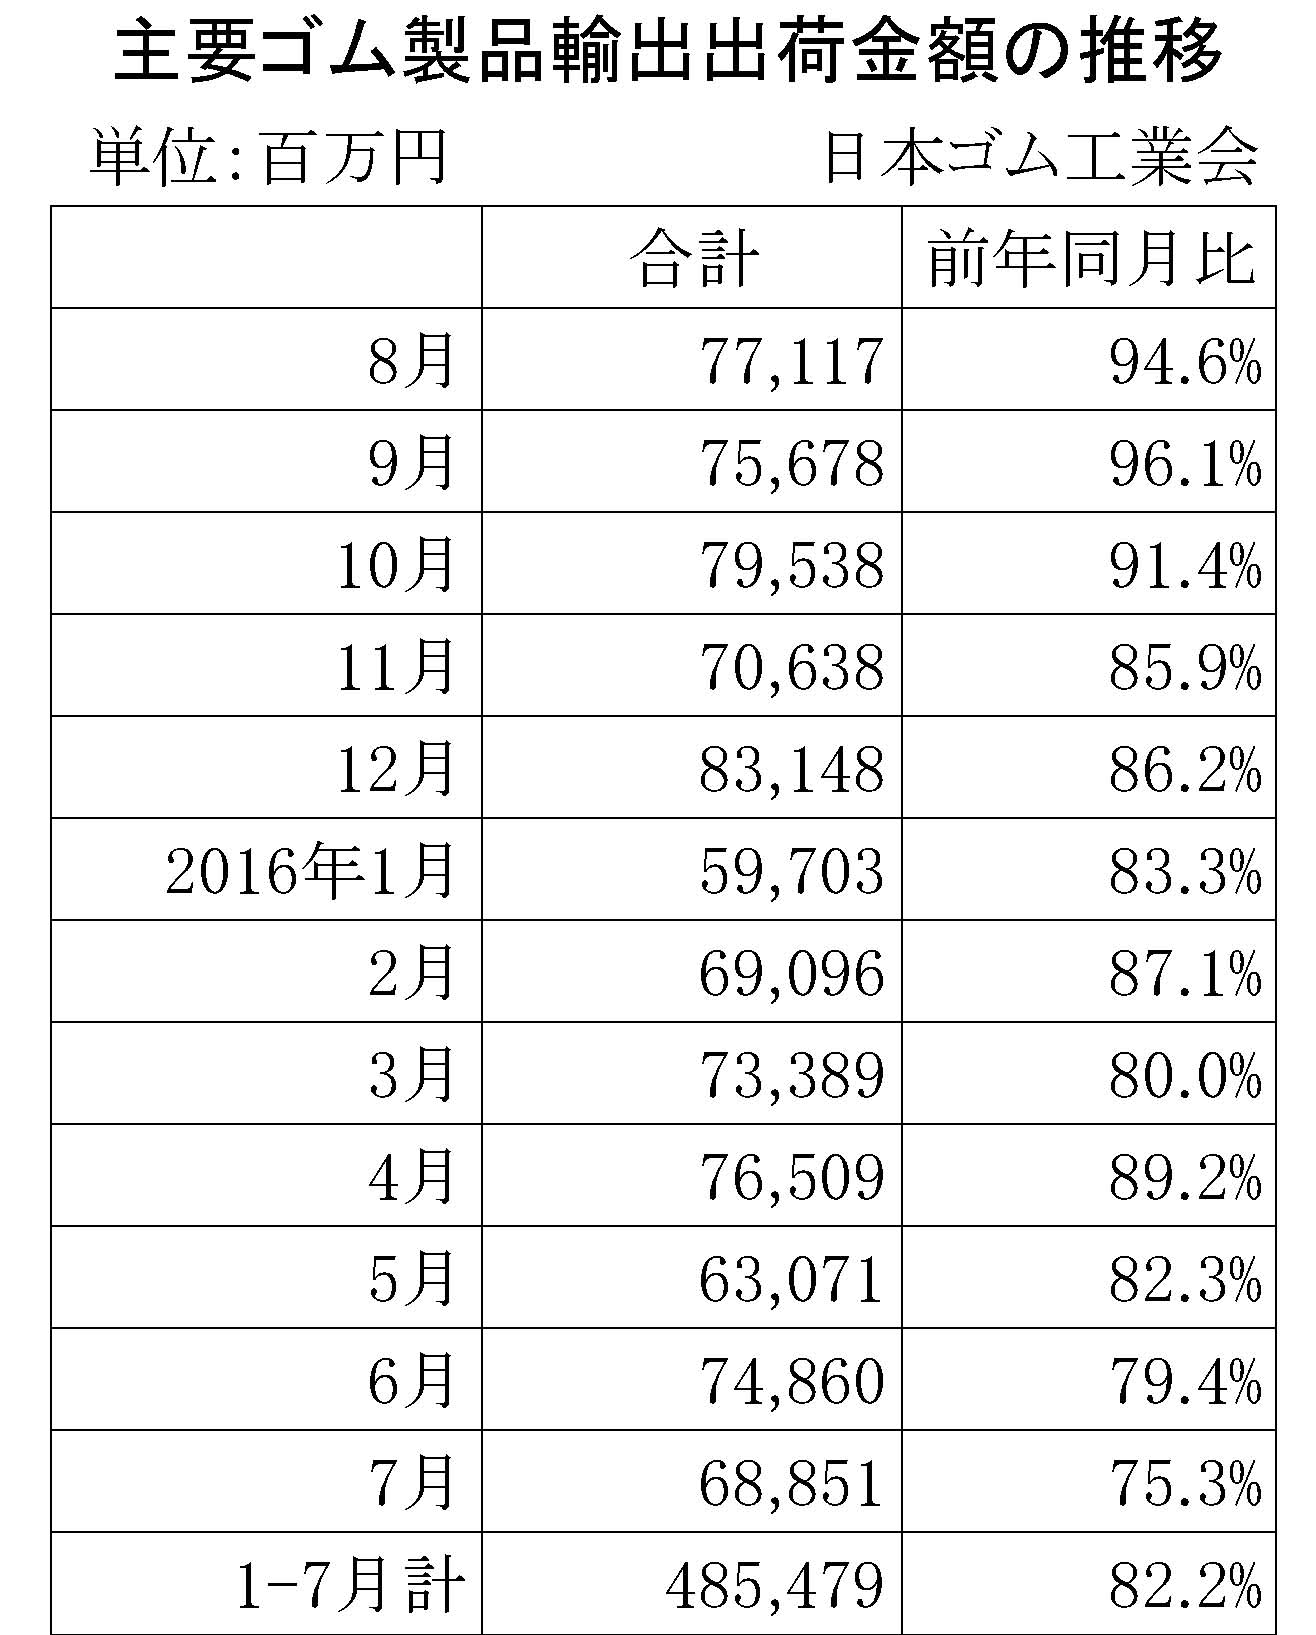 2016-7月ゴム製品輸出金額